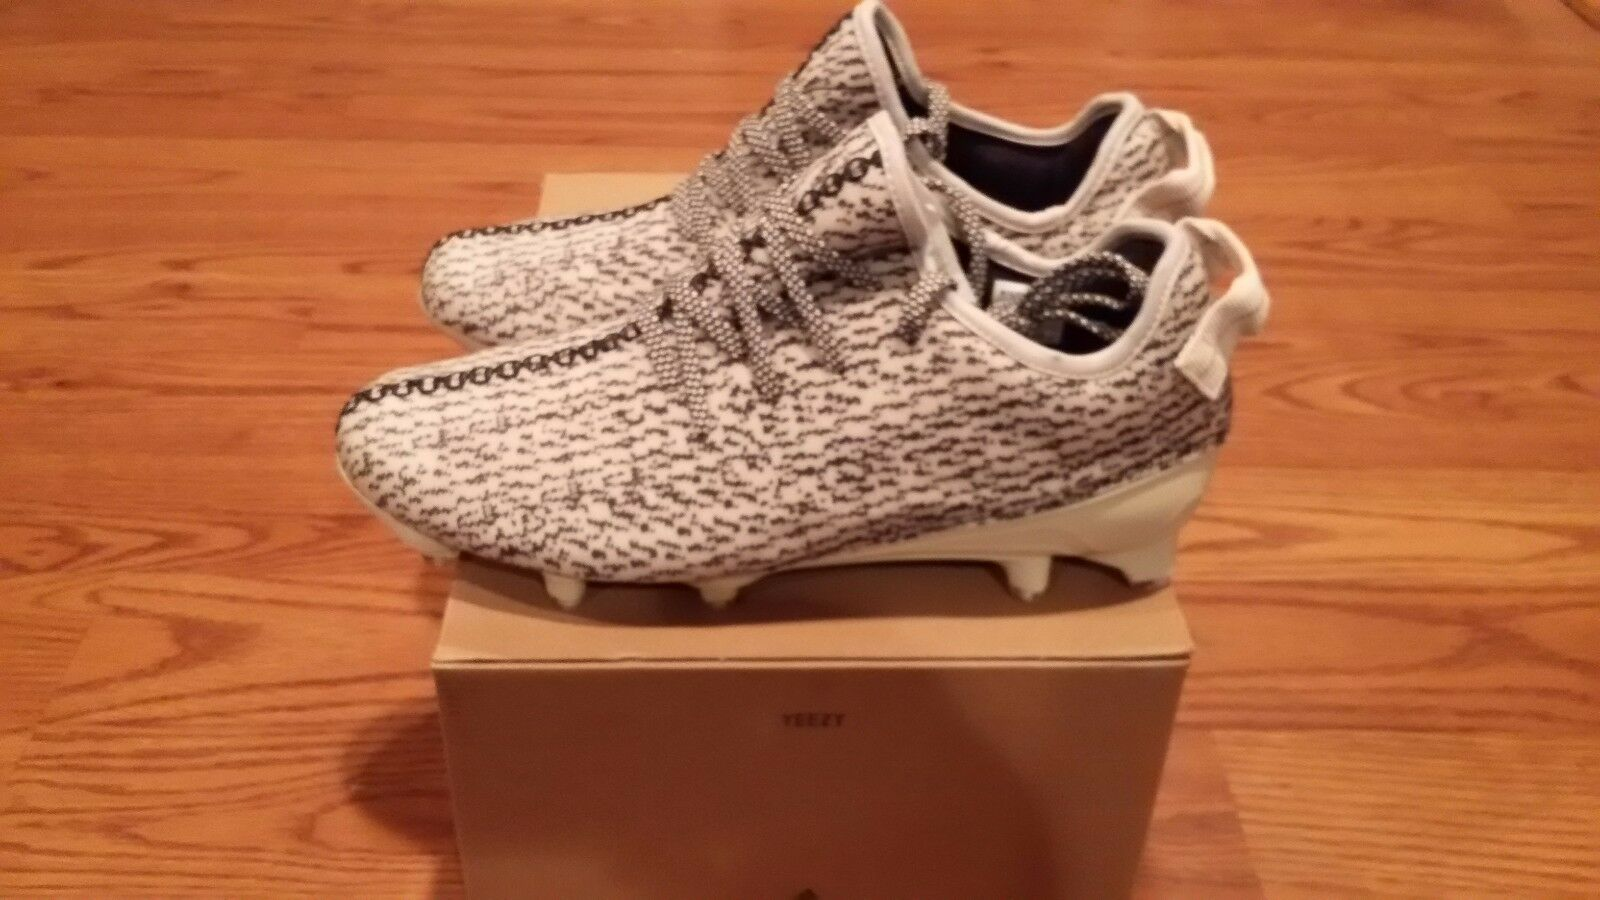 Adidas Yeezy 350 Cleat Size 11 w/ Receipt In Hand Ready to Ship